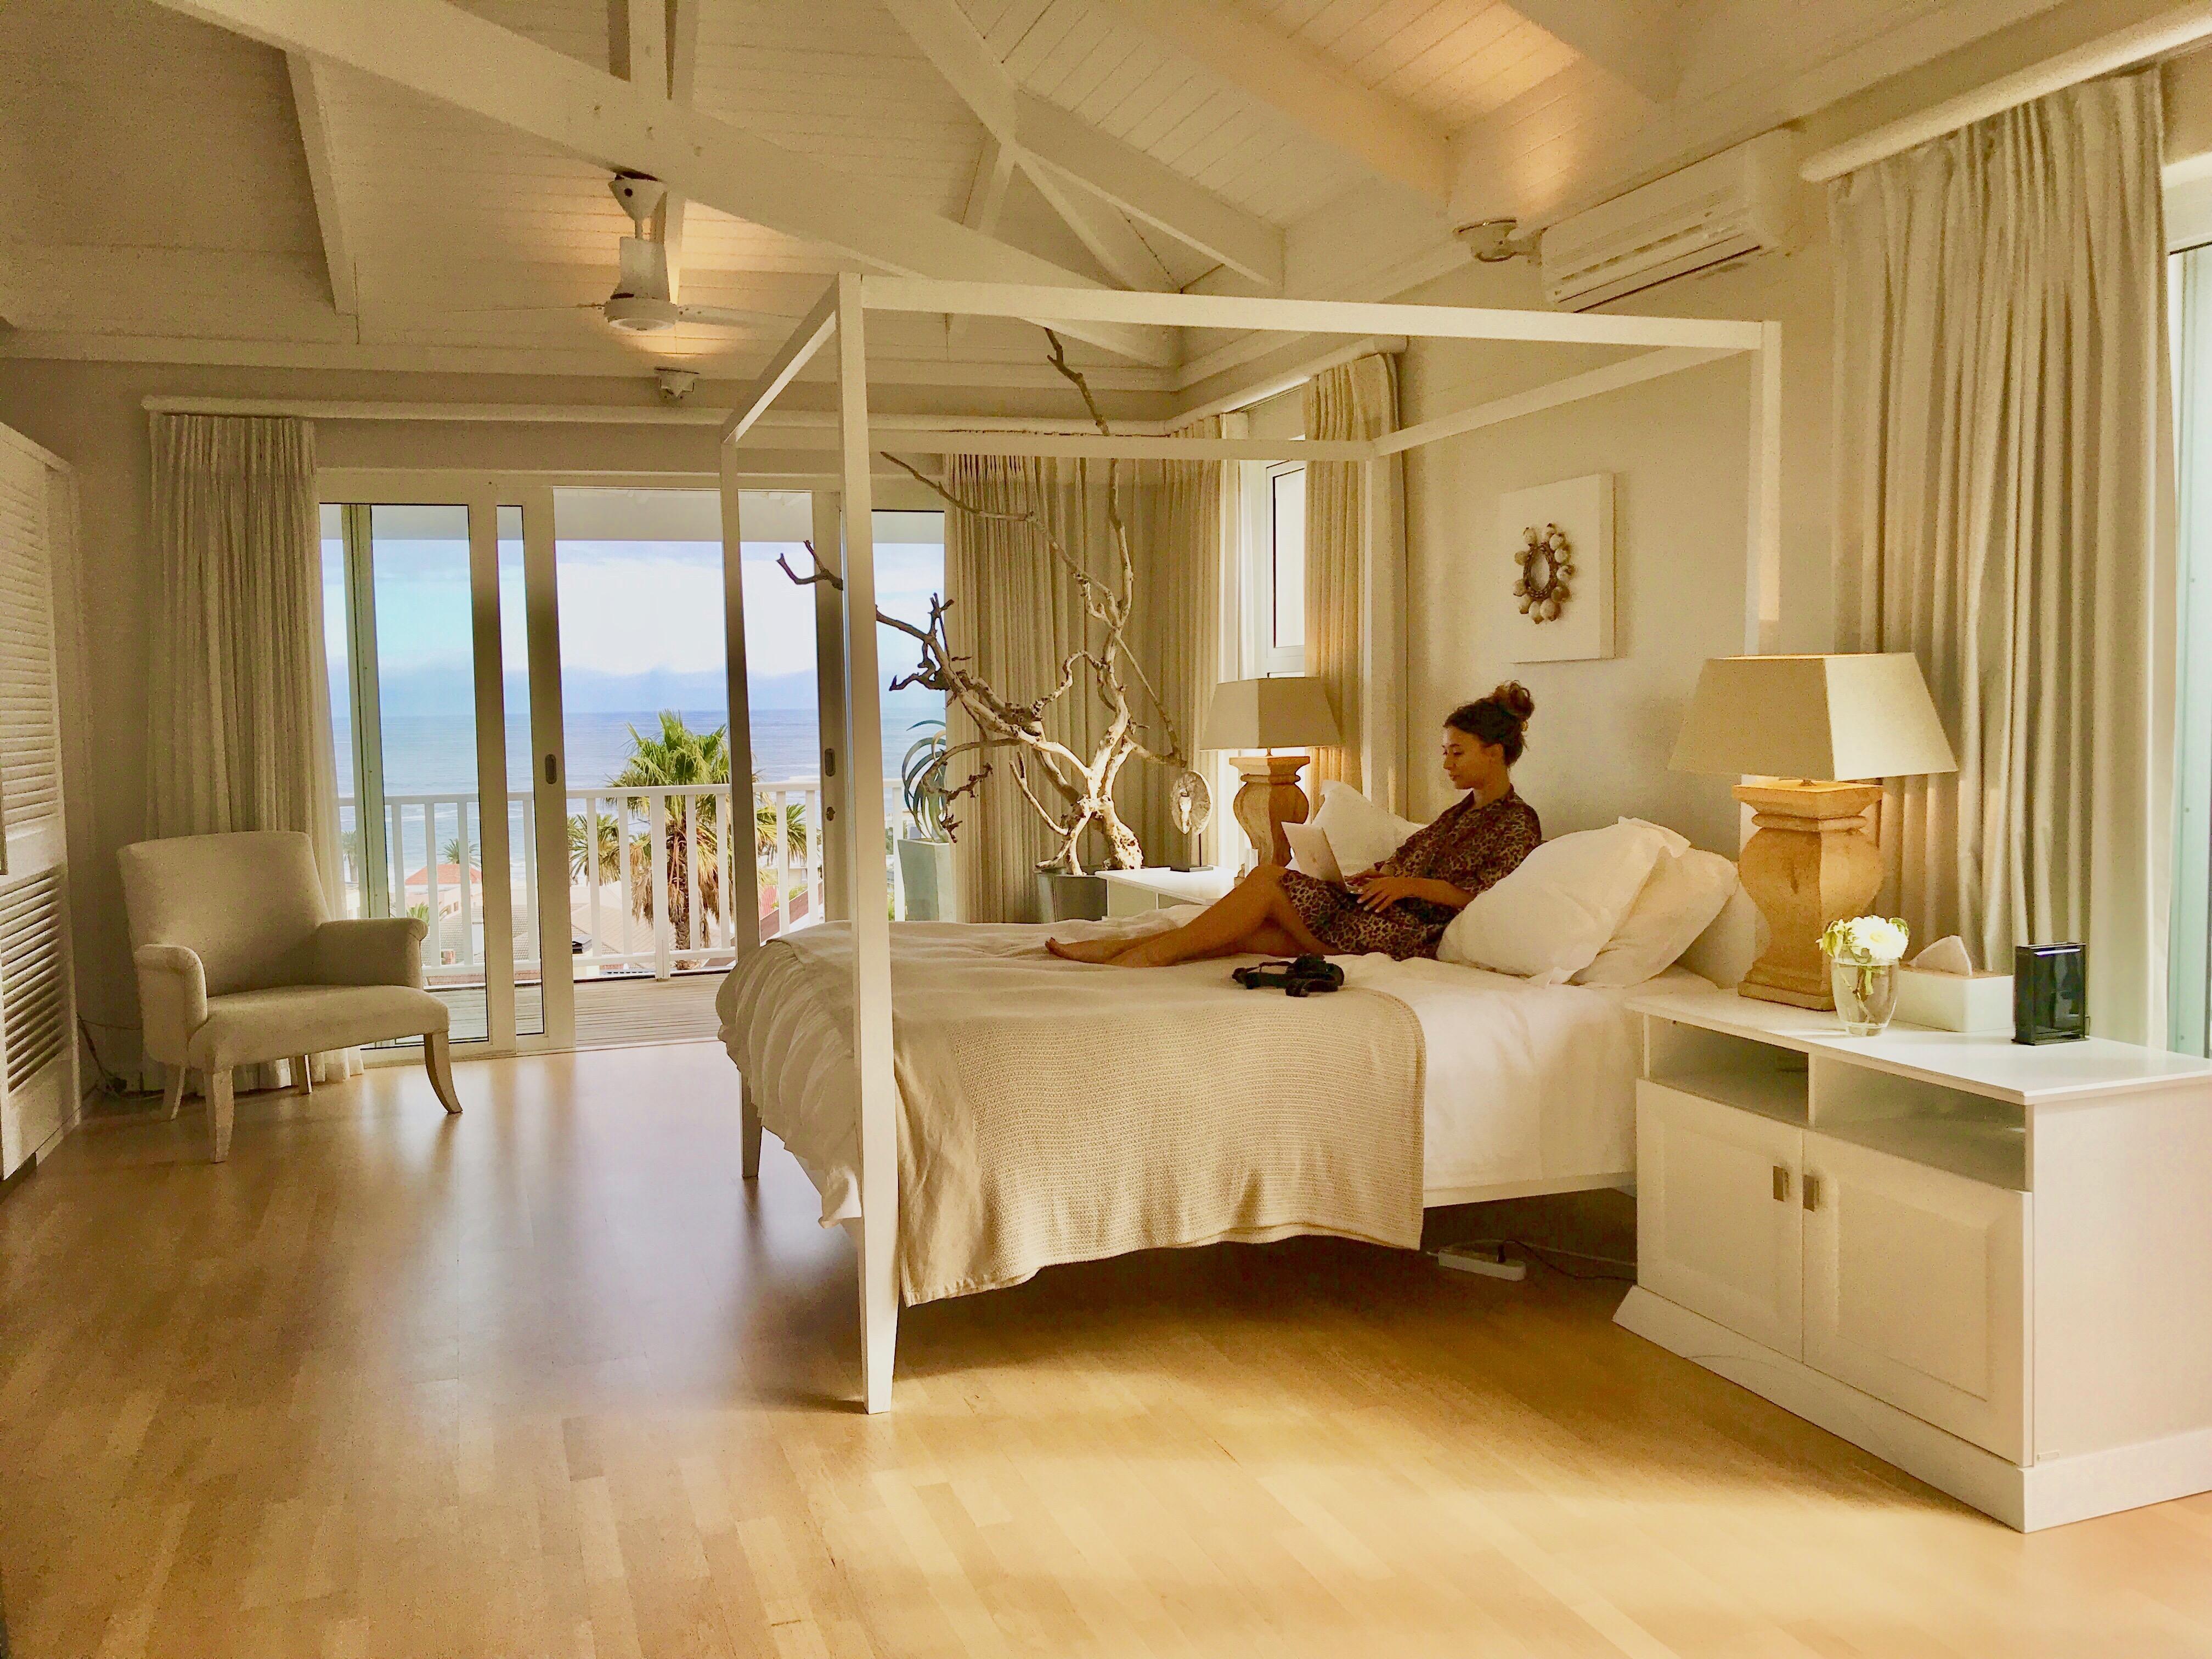 penthouse-suite-seafivehotel-capetown-lustforthesublime